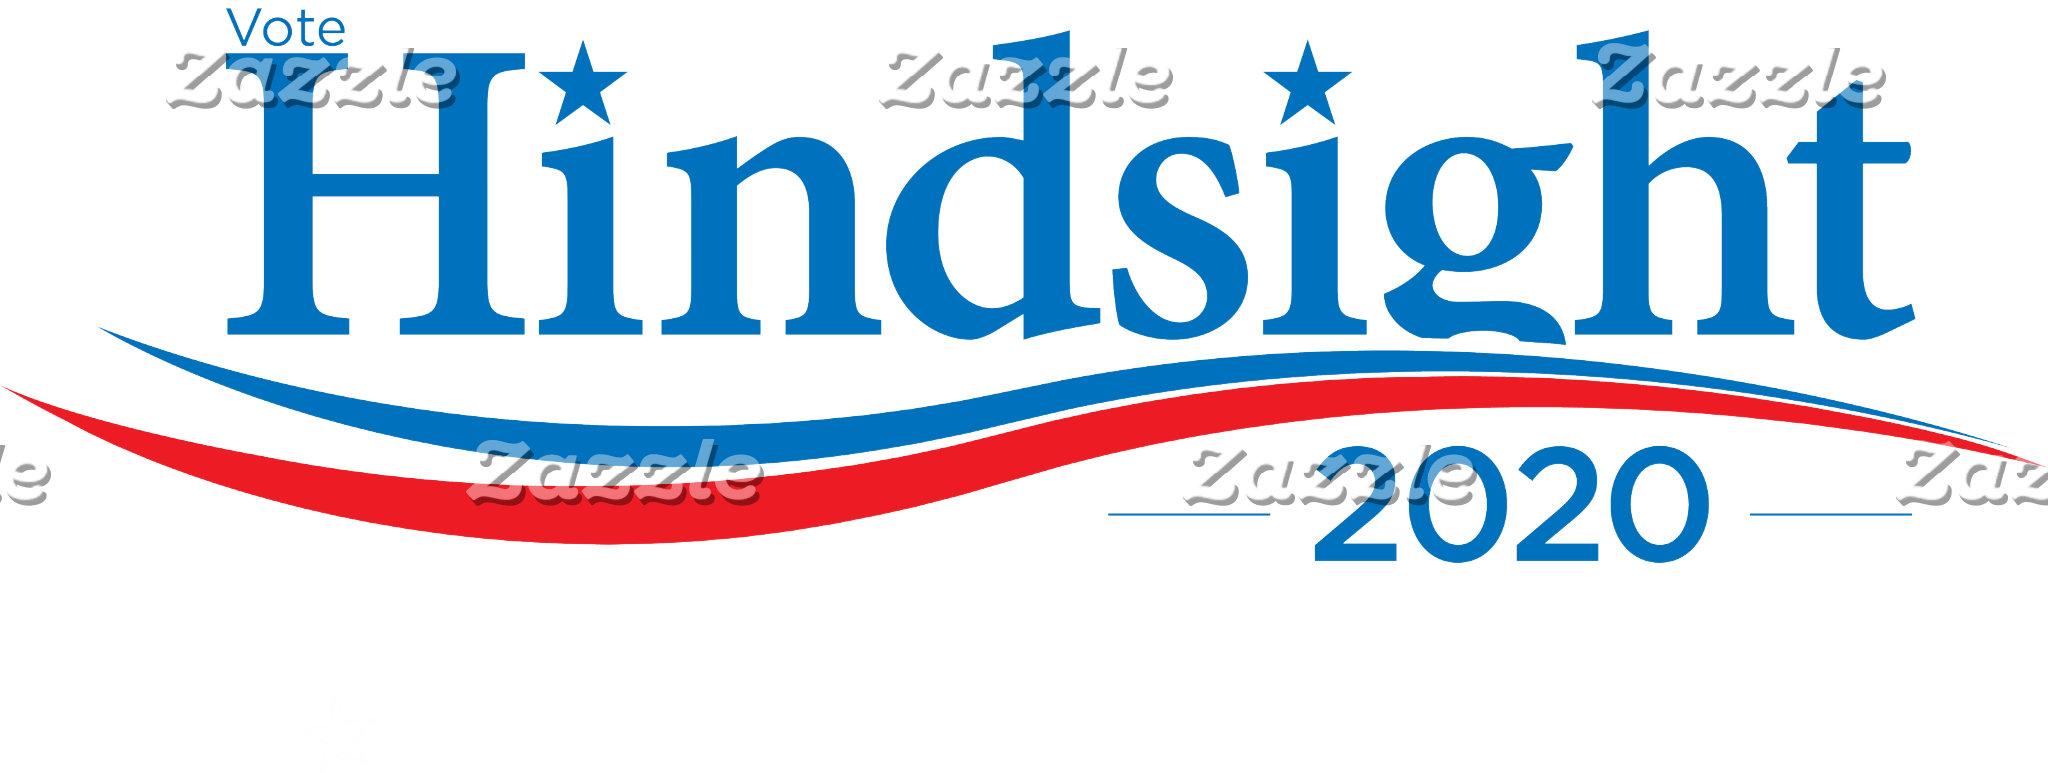 Vote Hindsight 2020